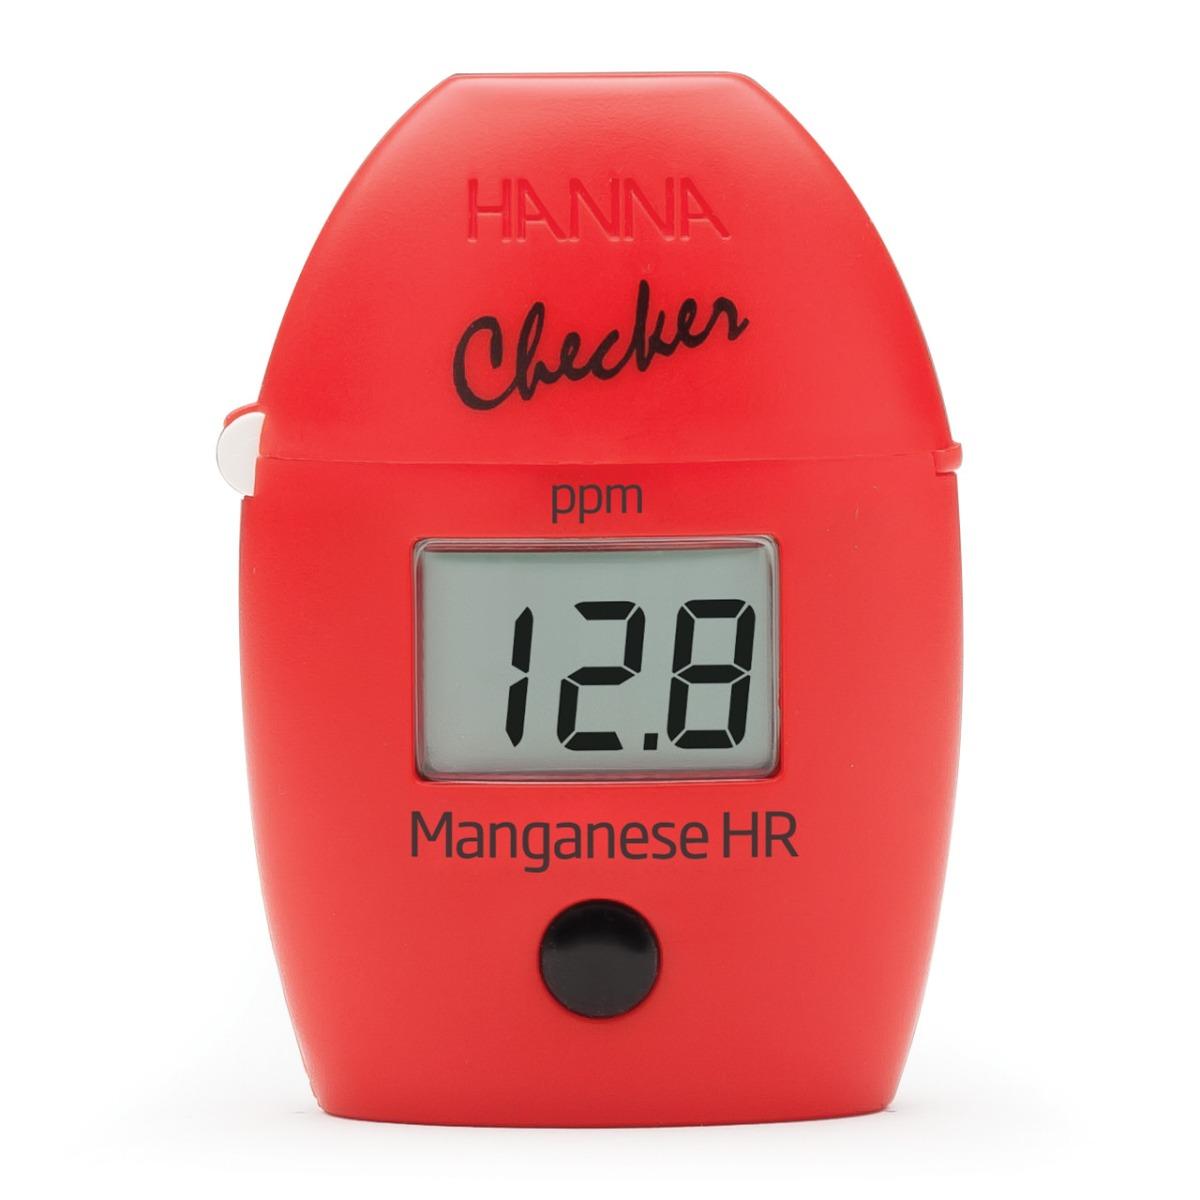 Manganese High Range Checker® HC - HI709